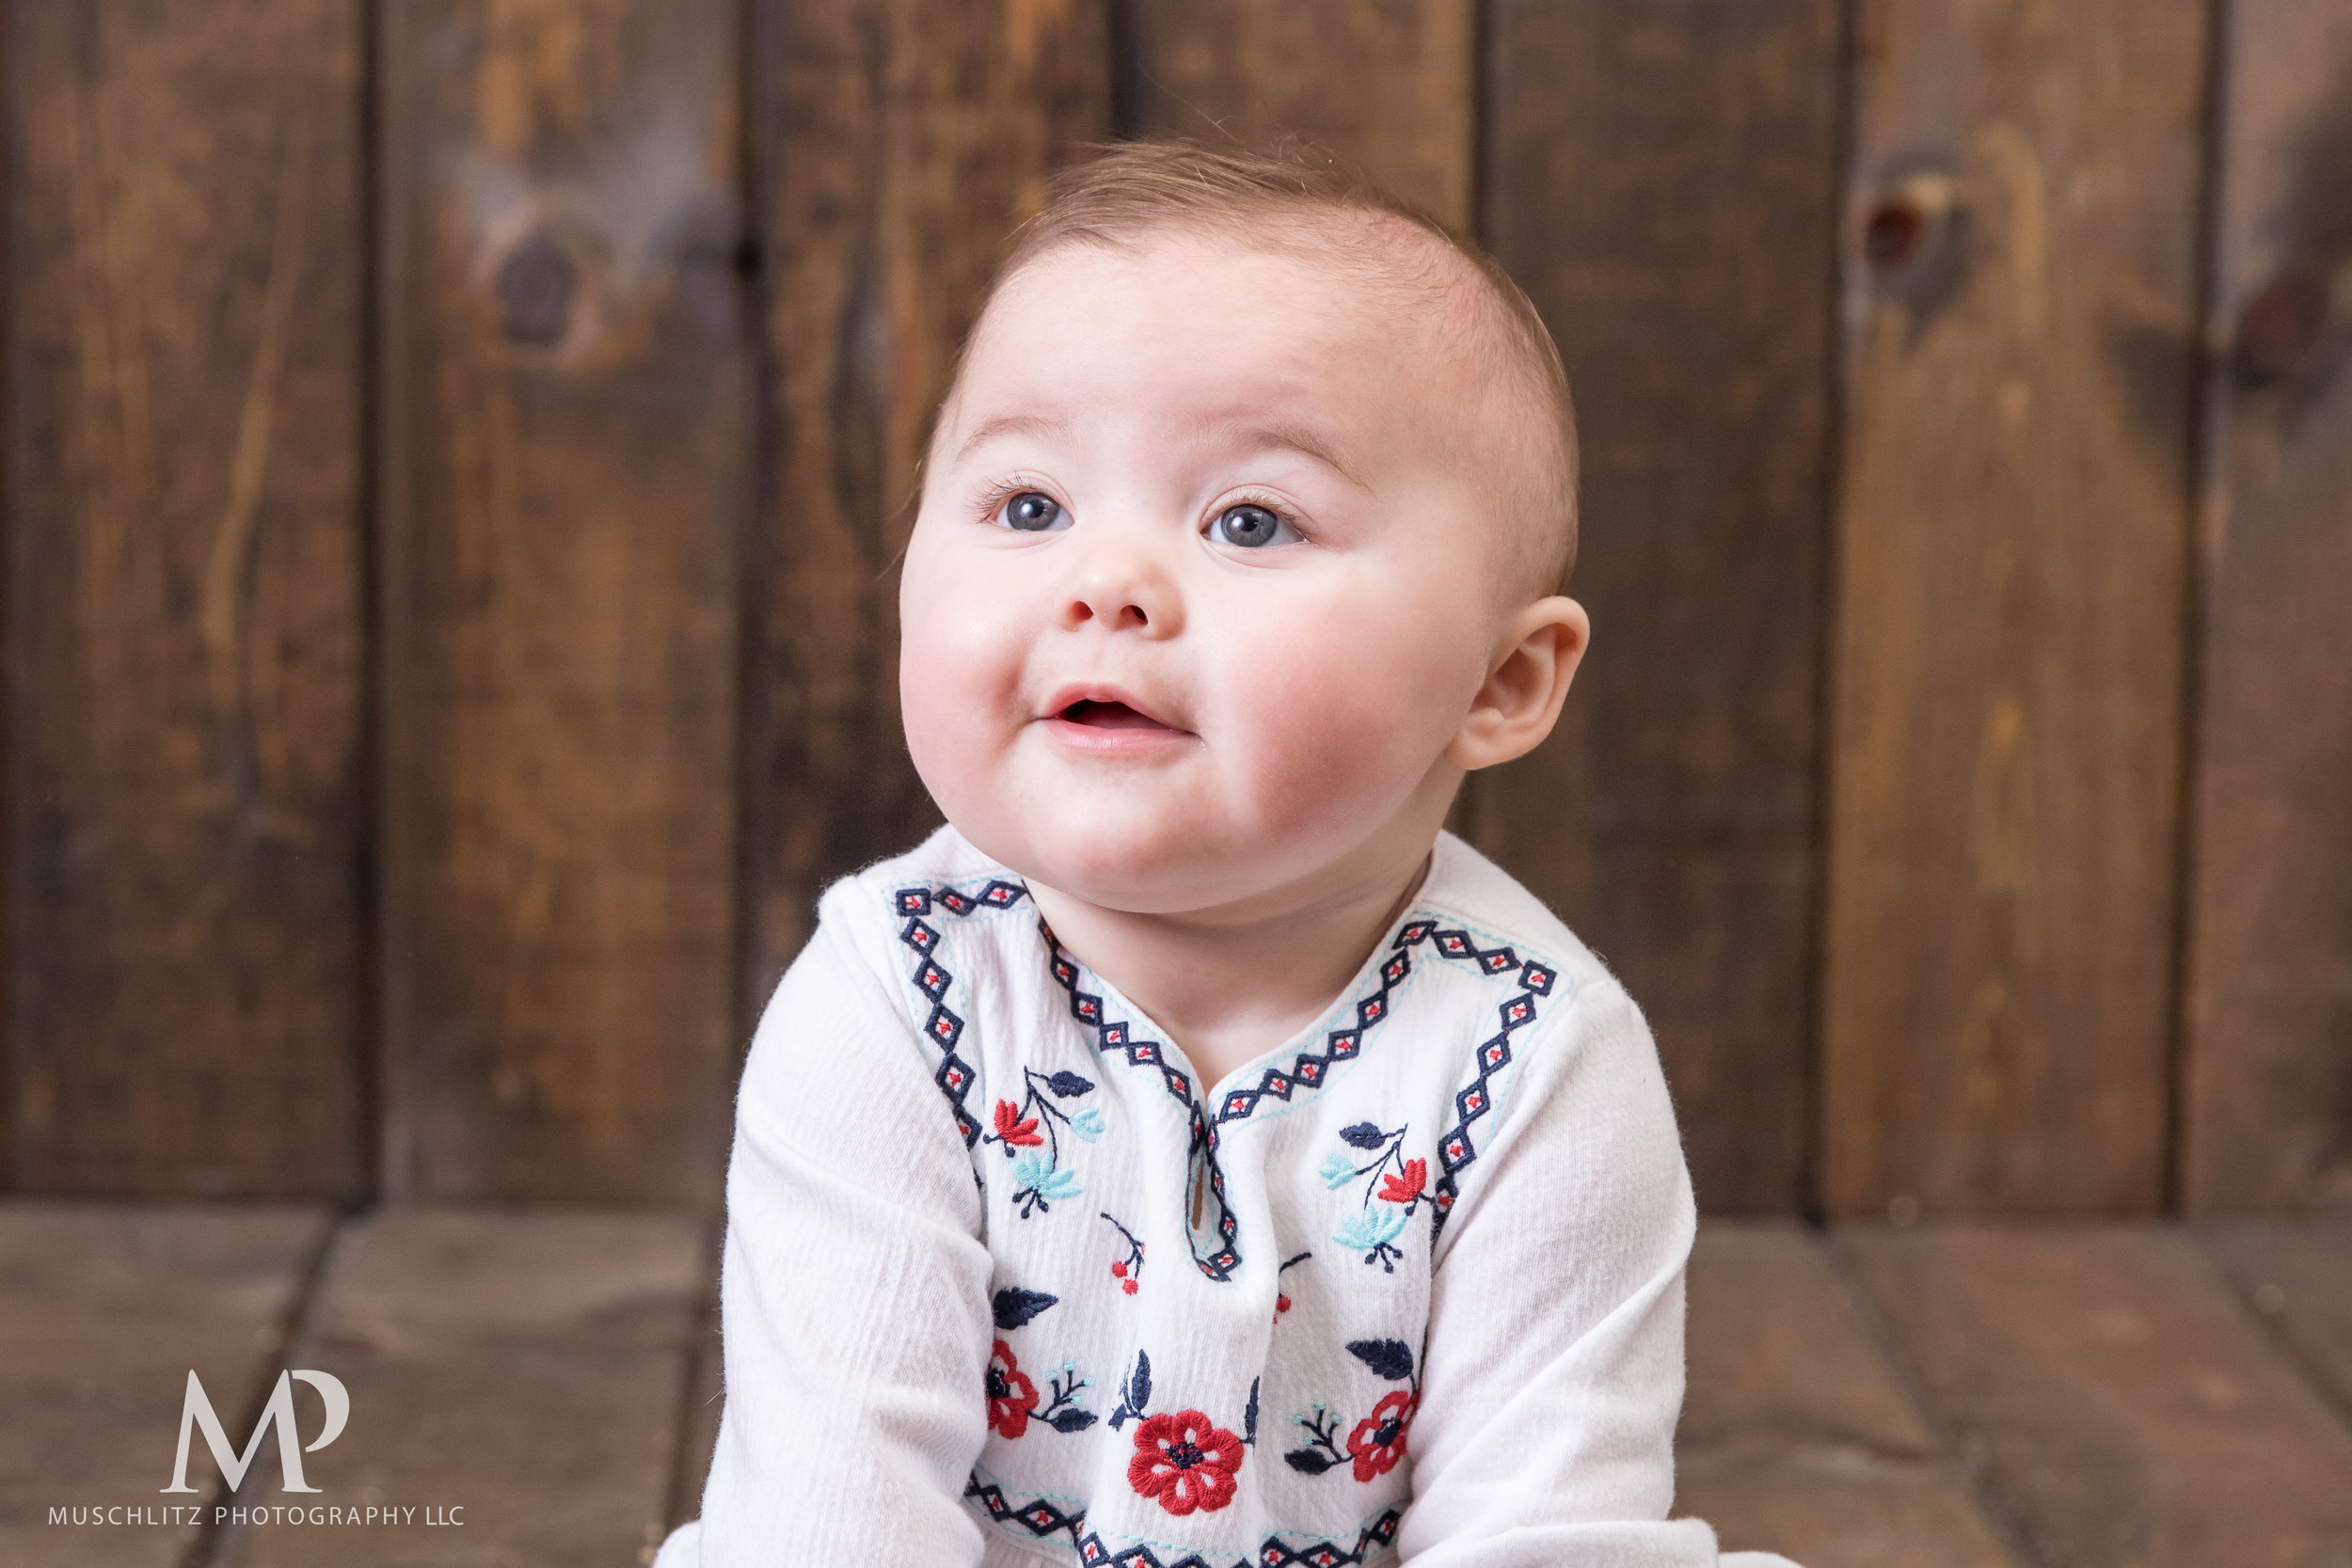 6-month-portraits-baby-photographer-columbus-ohio-gahanna-muschlitz-photography-014.JPG